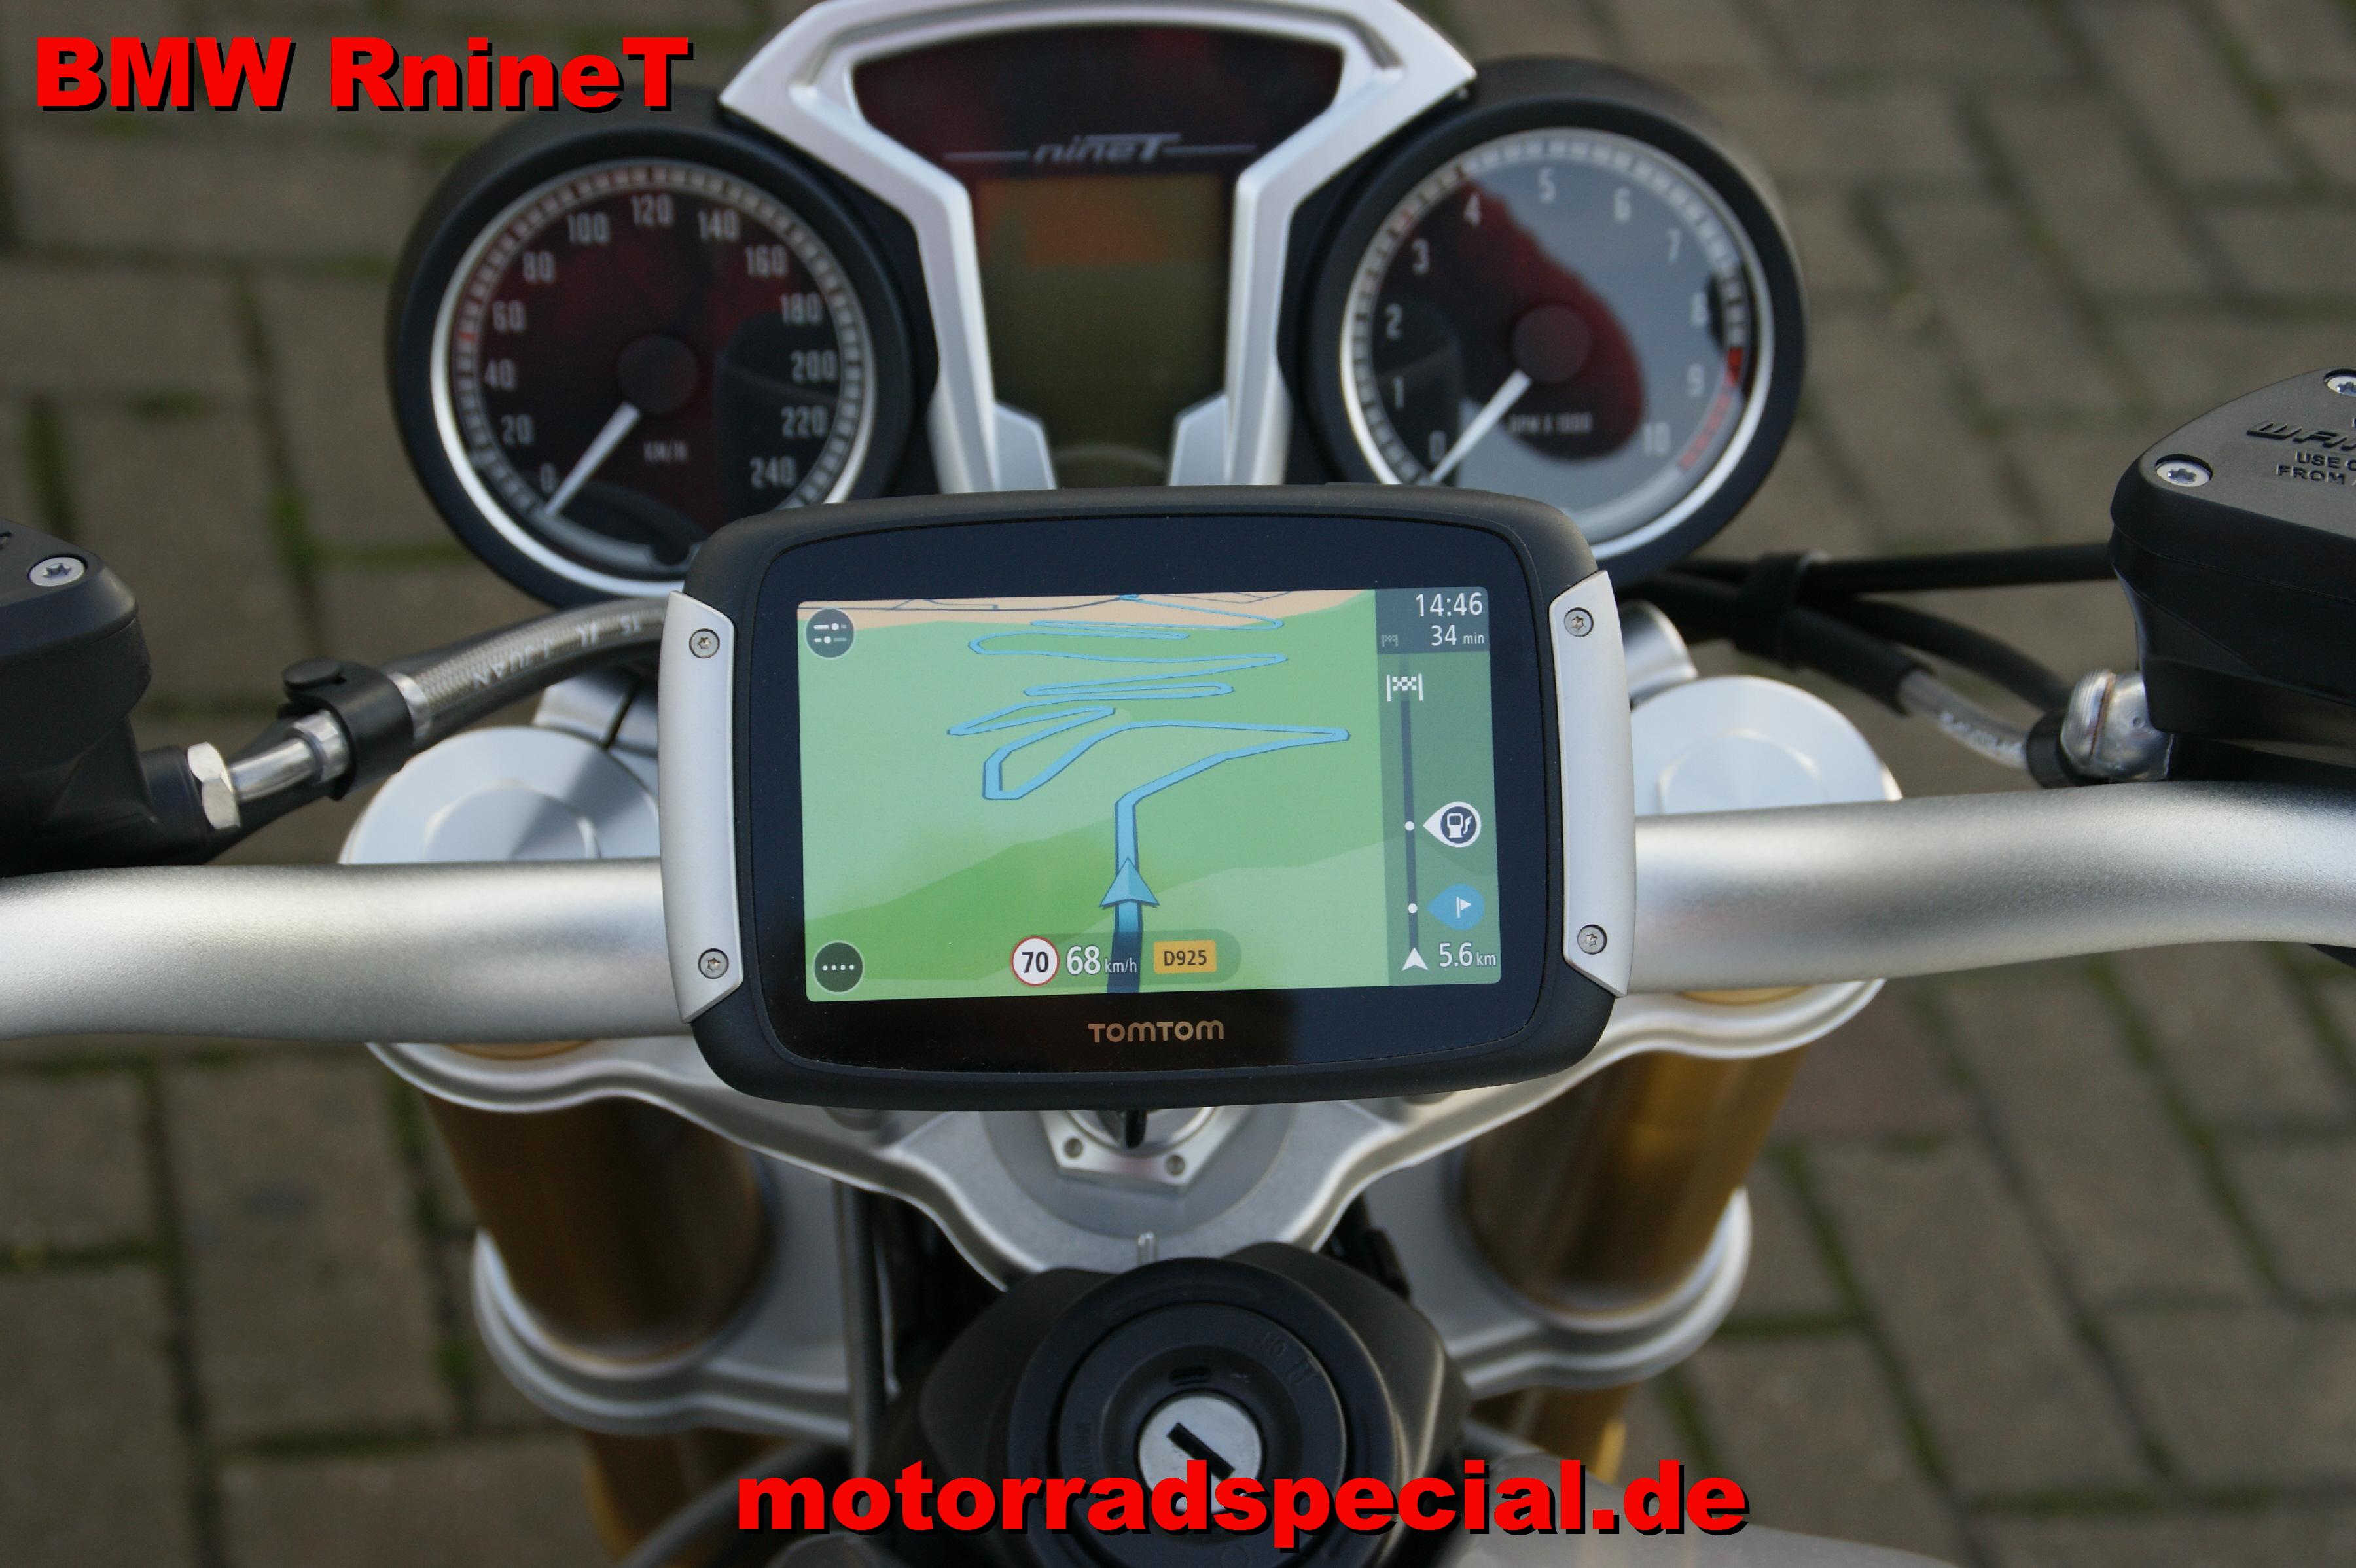 navigationshalter f r bmw rninet tomtom rider 400 410 eu motorrad special ihre. Black Bedroom Furniture Sets. Home Design Ideas